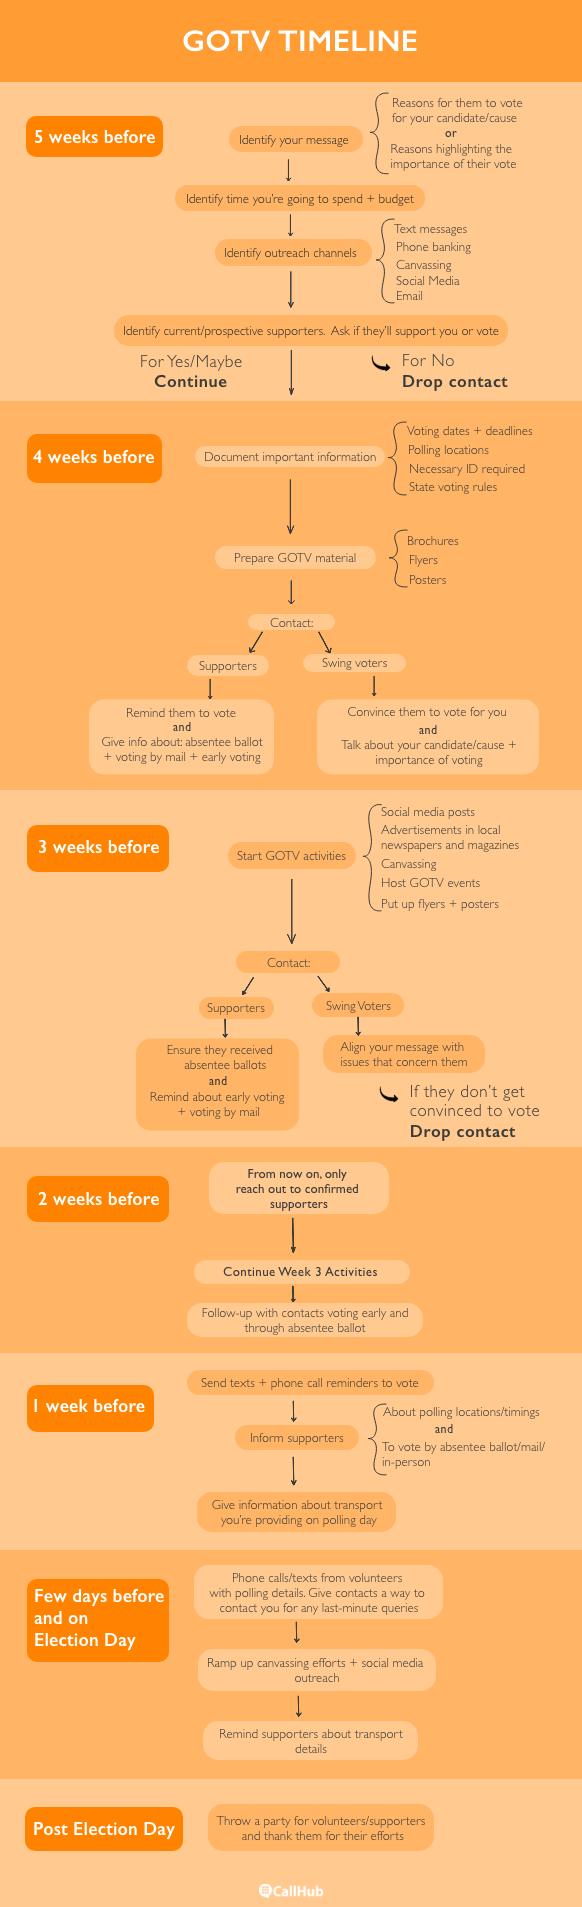 GOTV Timeline Infographic